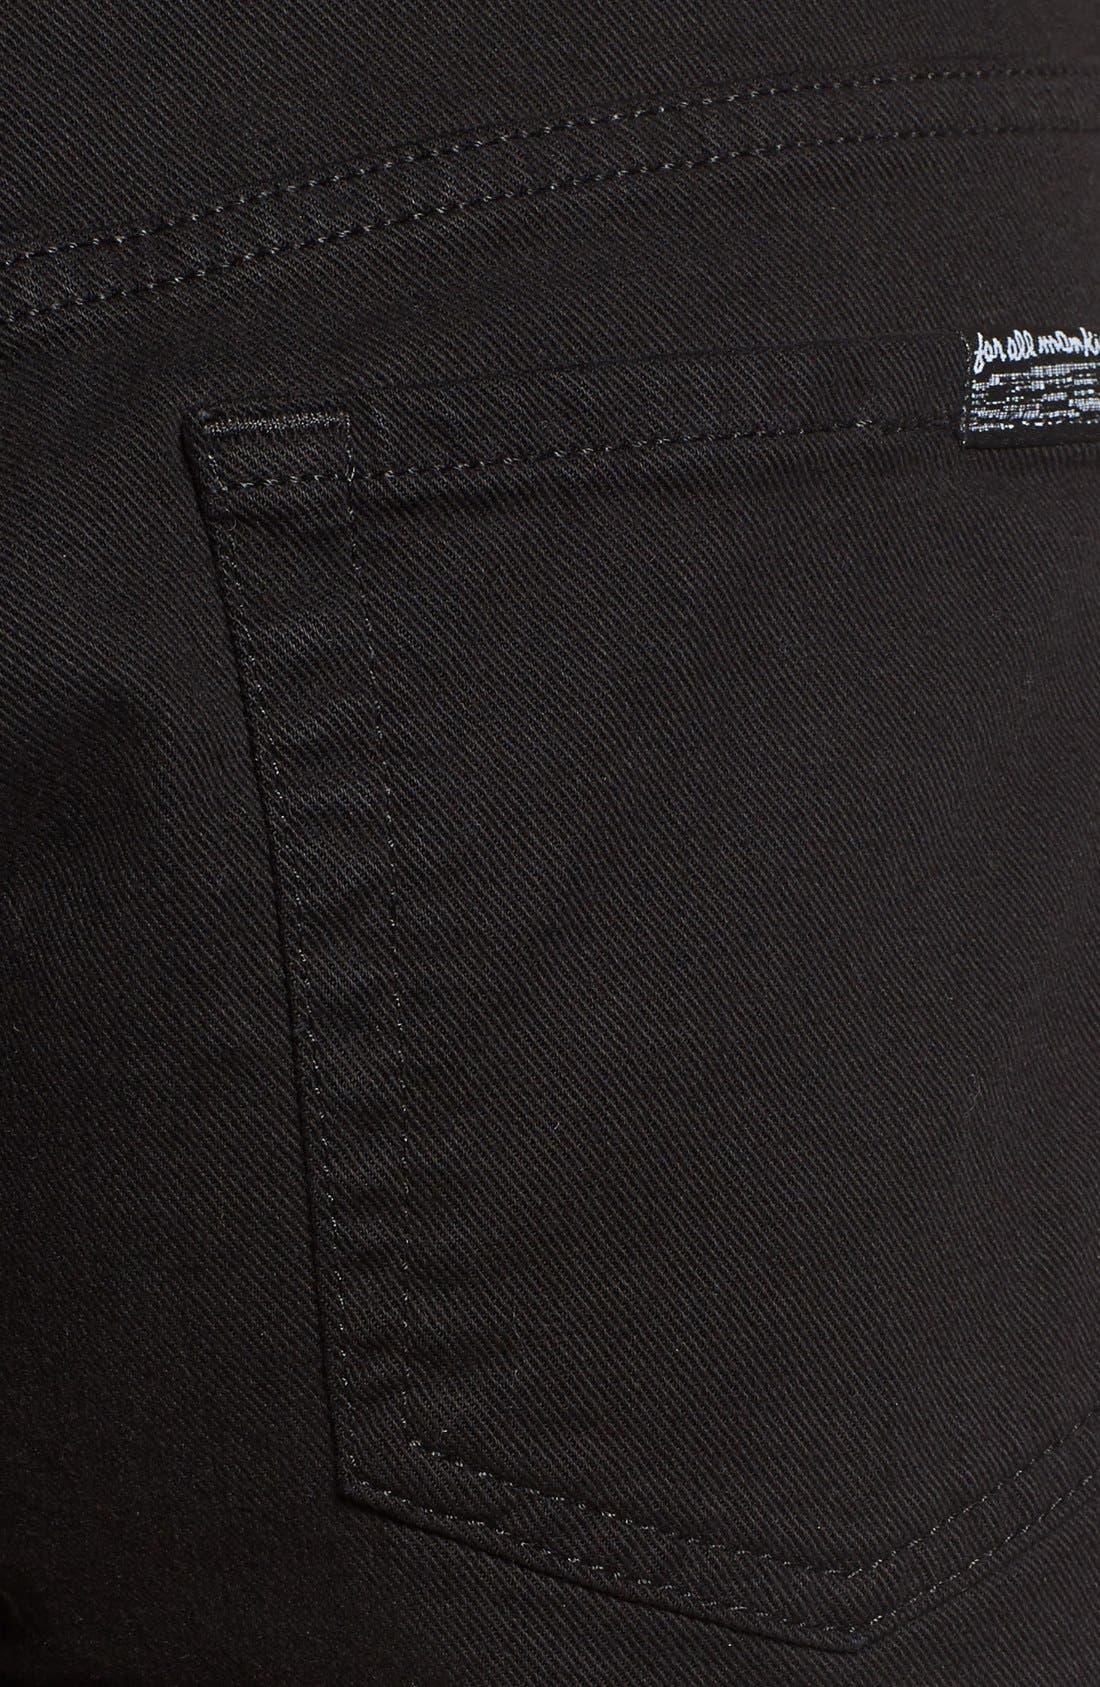 Cutoff Shorts,                             Alternate thumbnail 5, color,                             Black